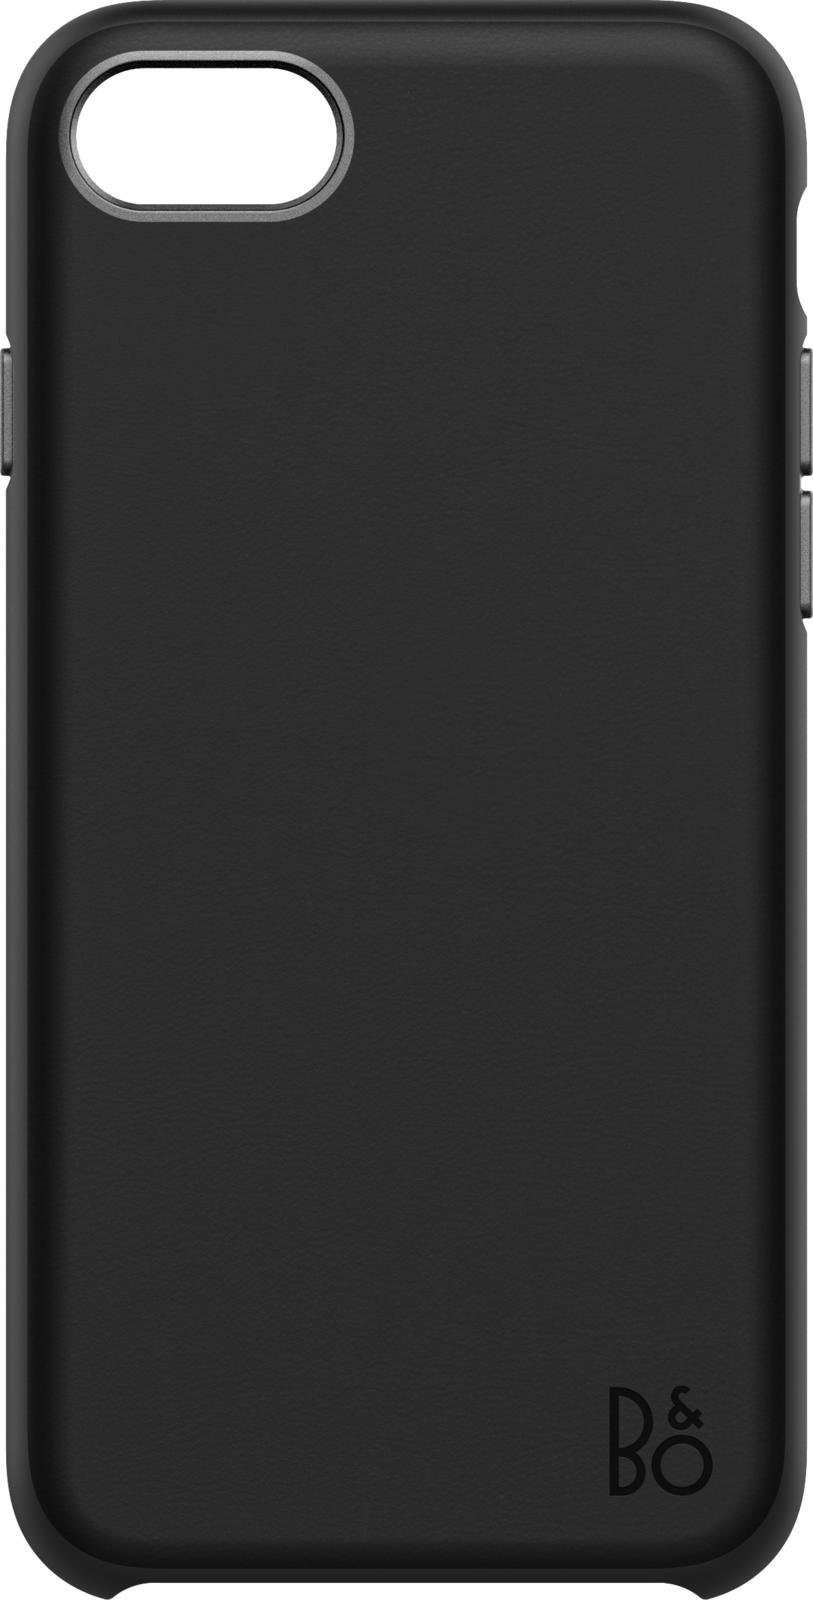 Incipio B&O Case iPhone 8/7/6s/6 Black Leather BOIPH-001-BLK - eet01